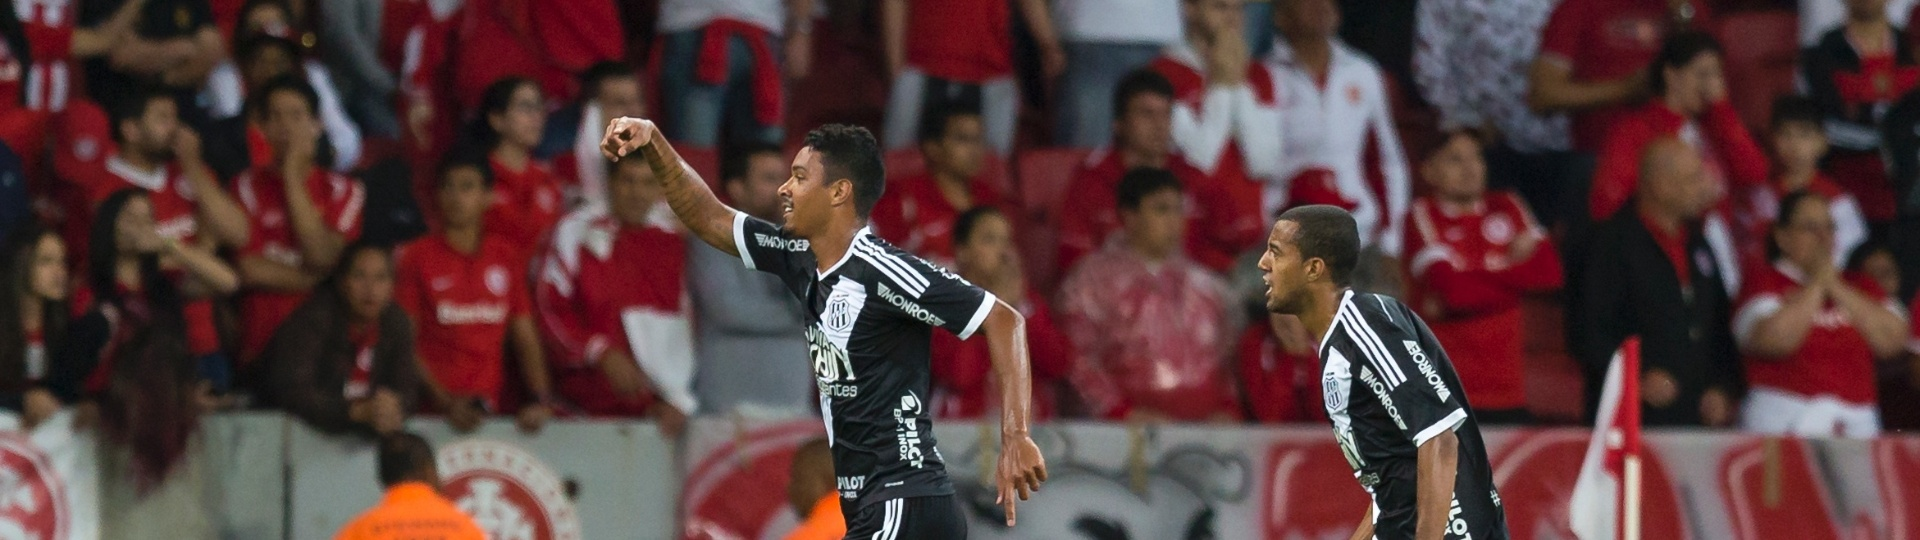 Antonio Carlos marca para a Ponte Preta contra o Internacional no Beira-Rio